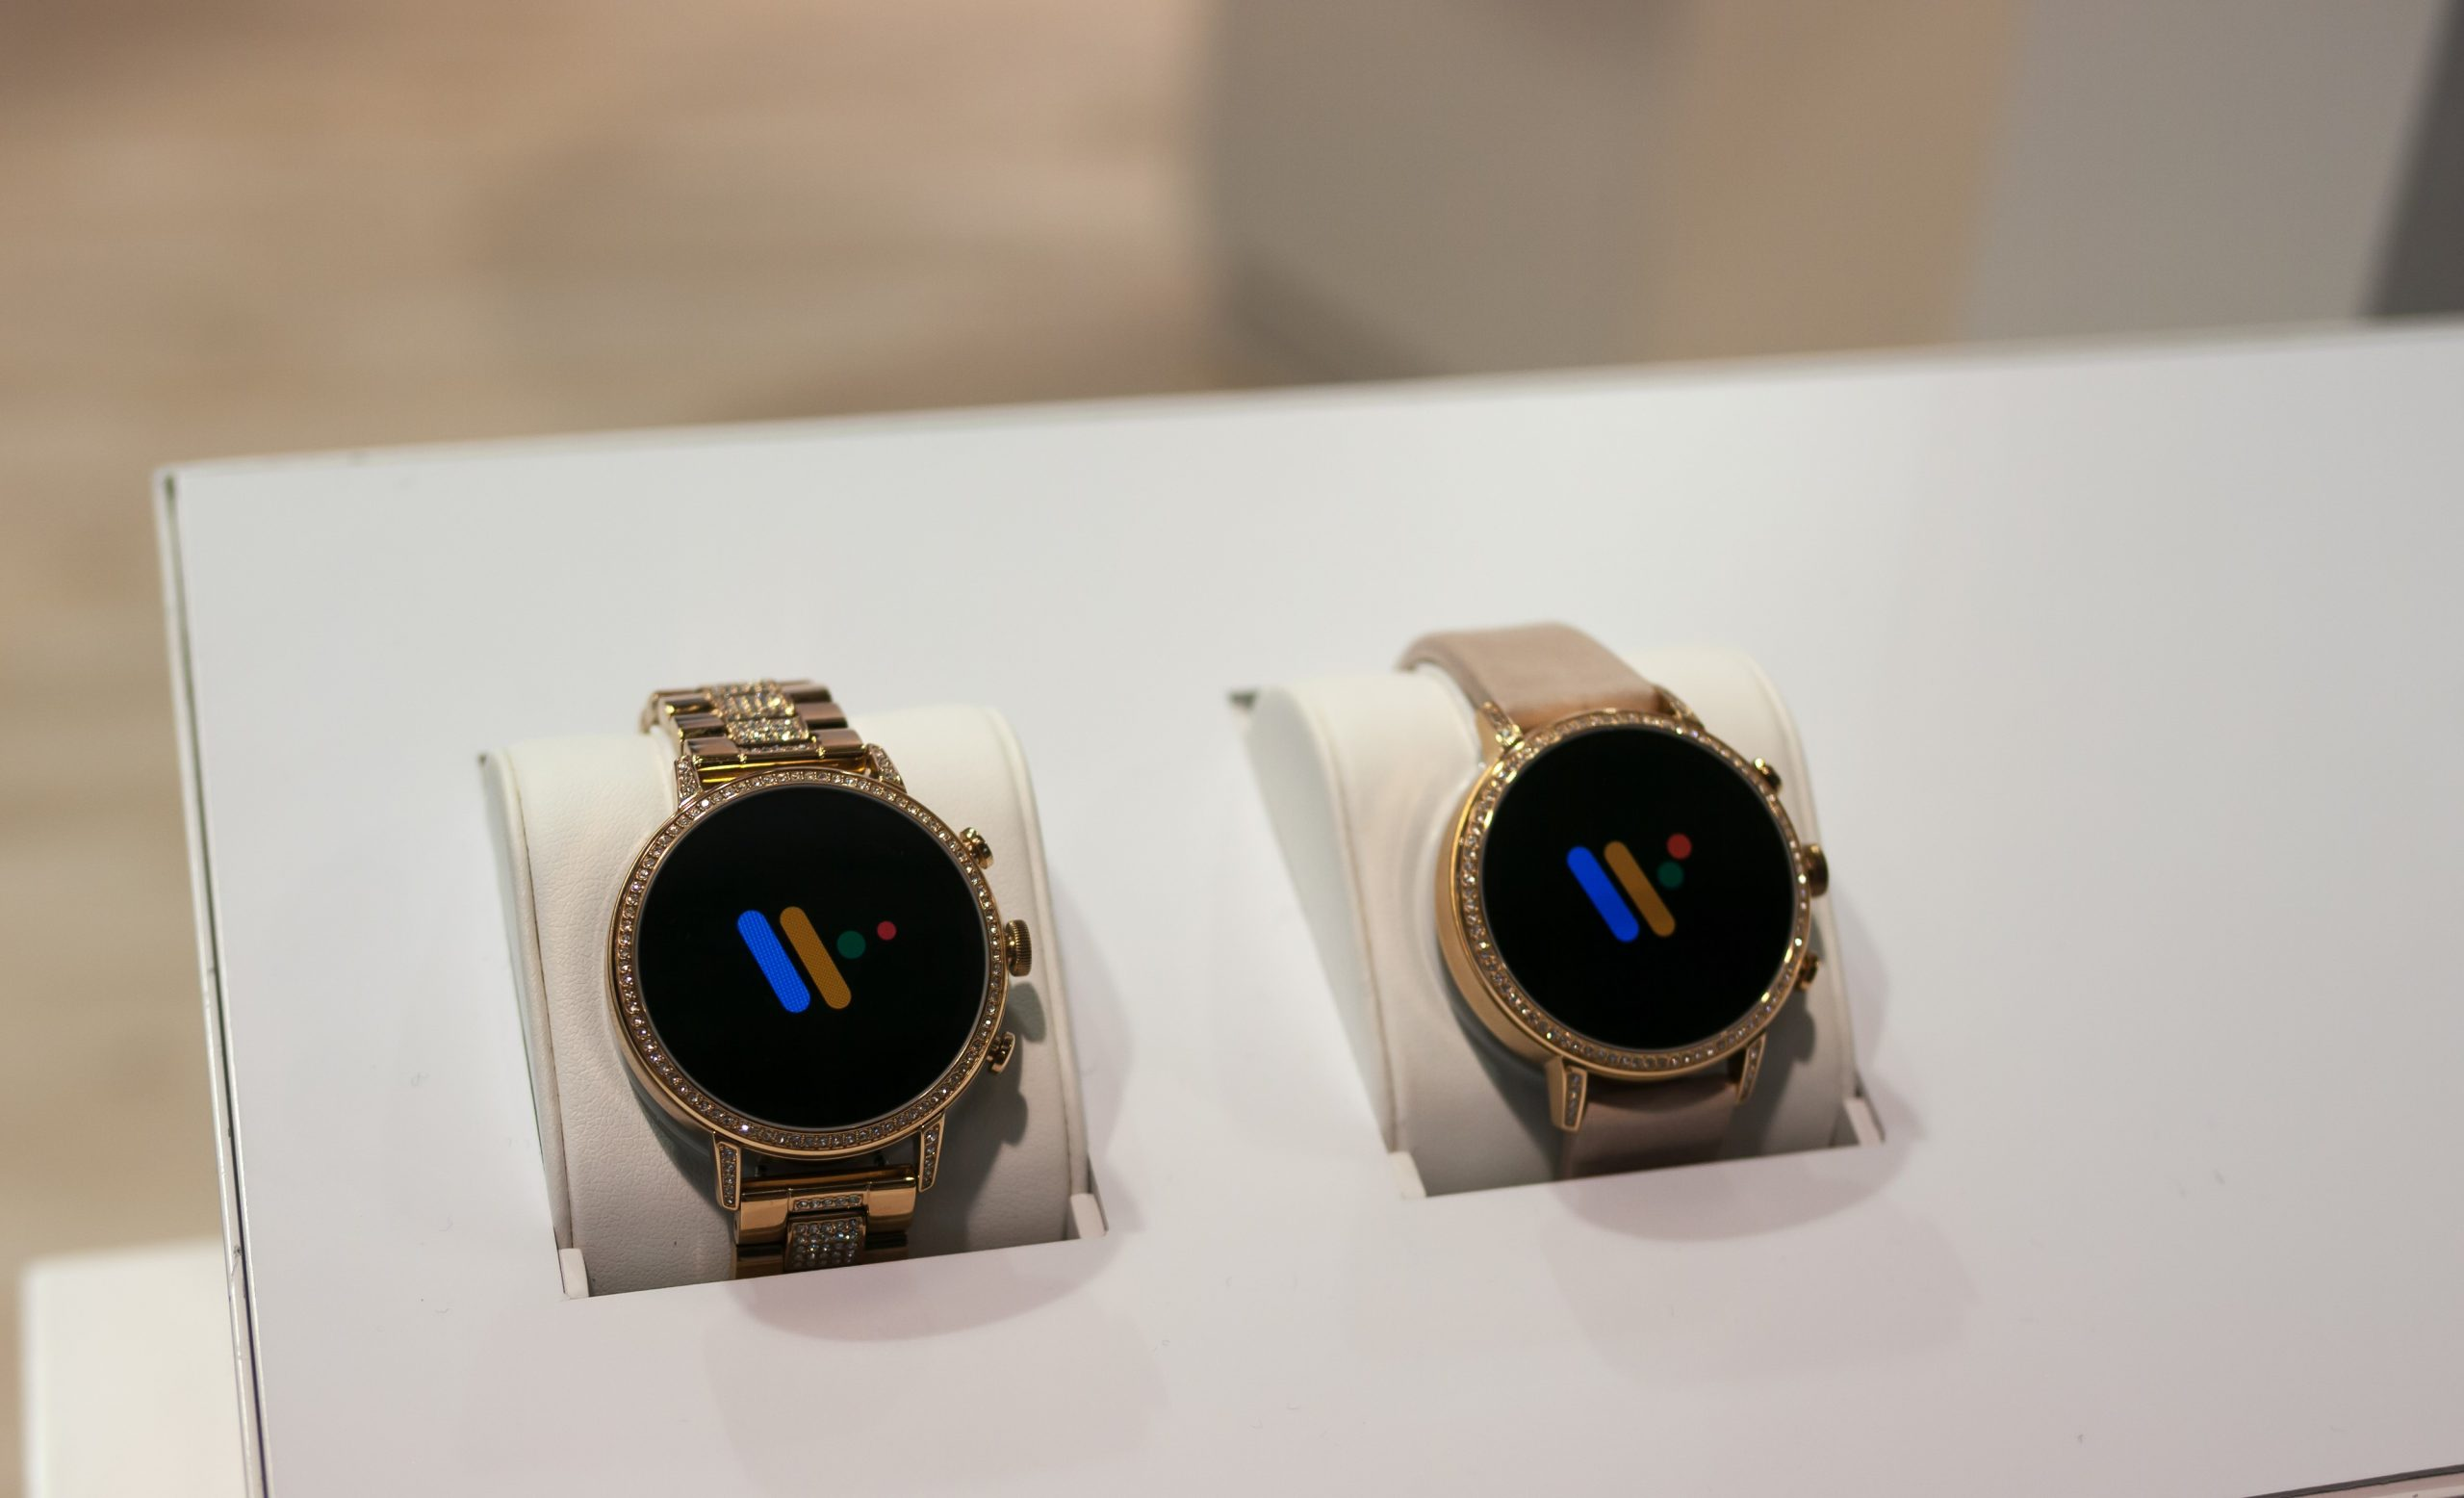 Designed smartwatch